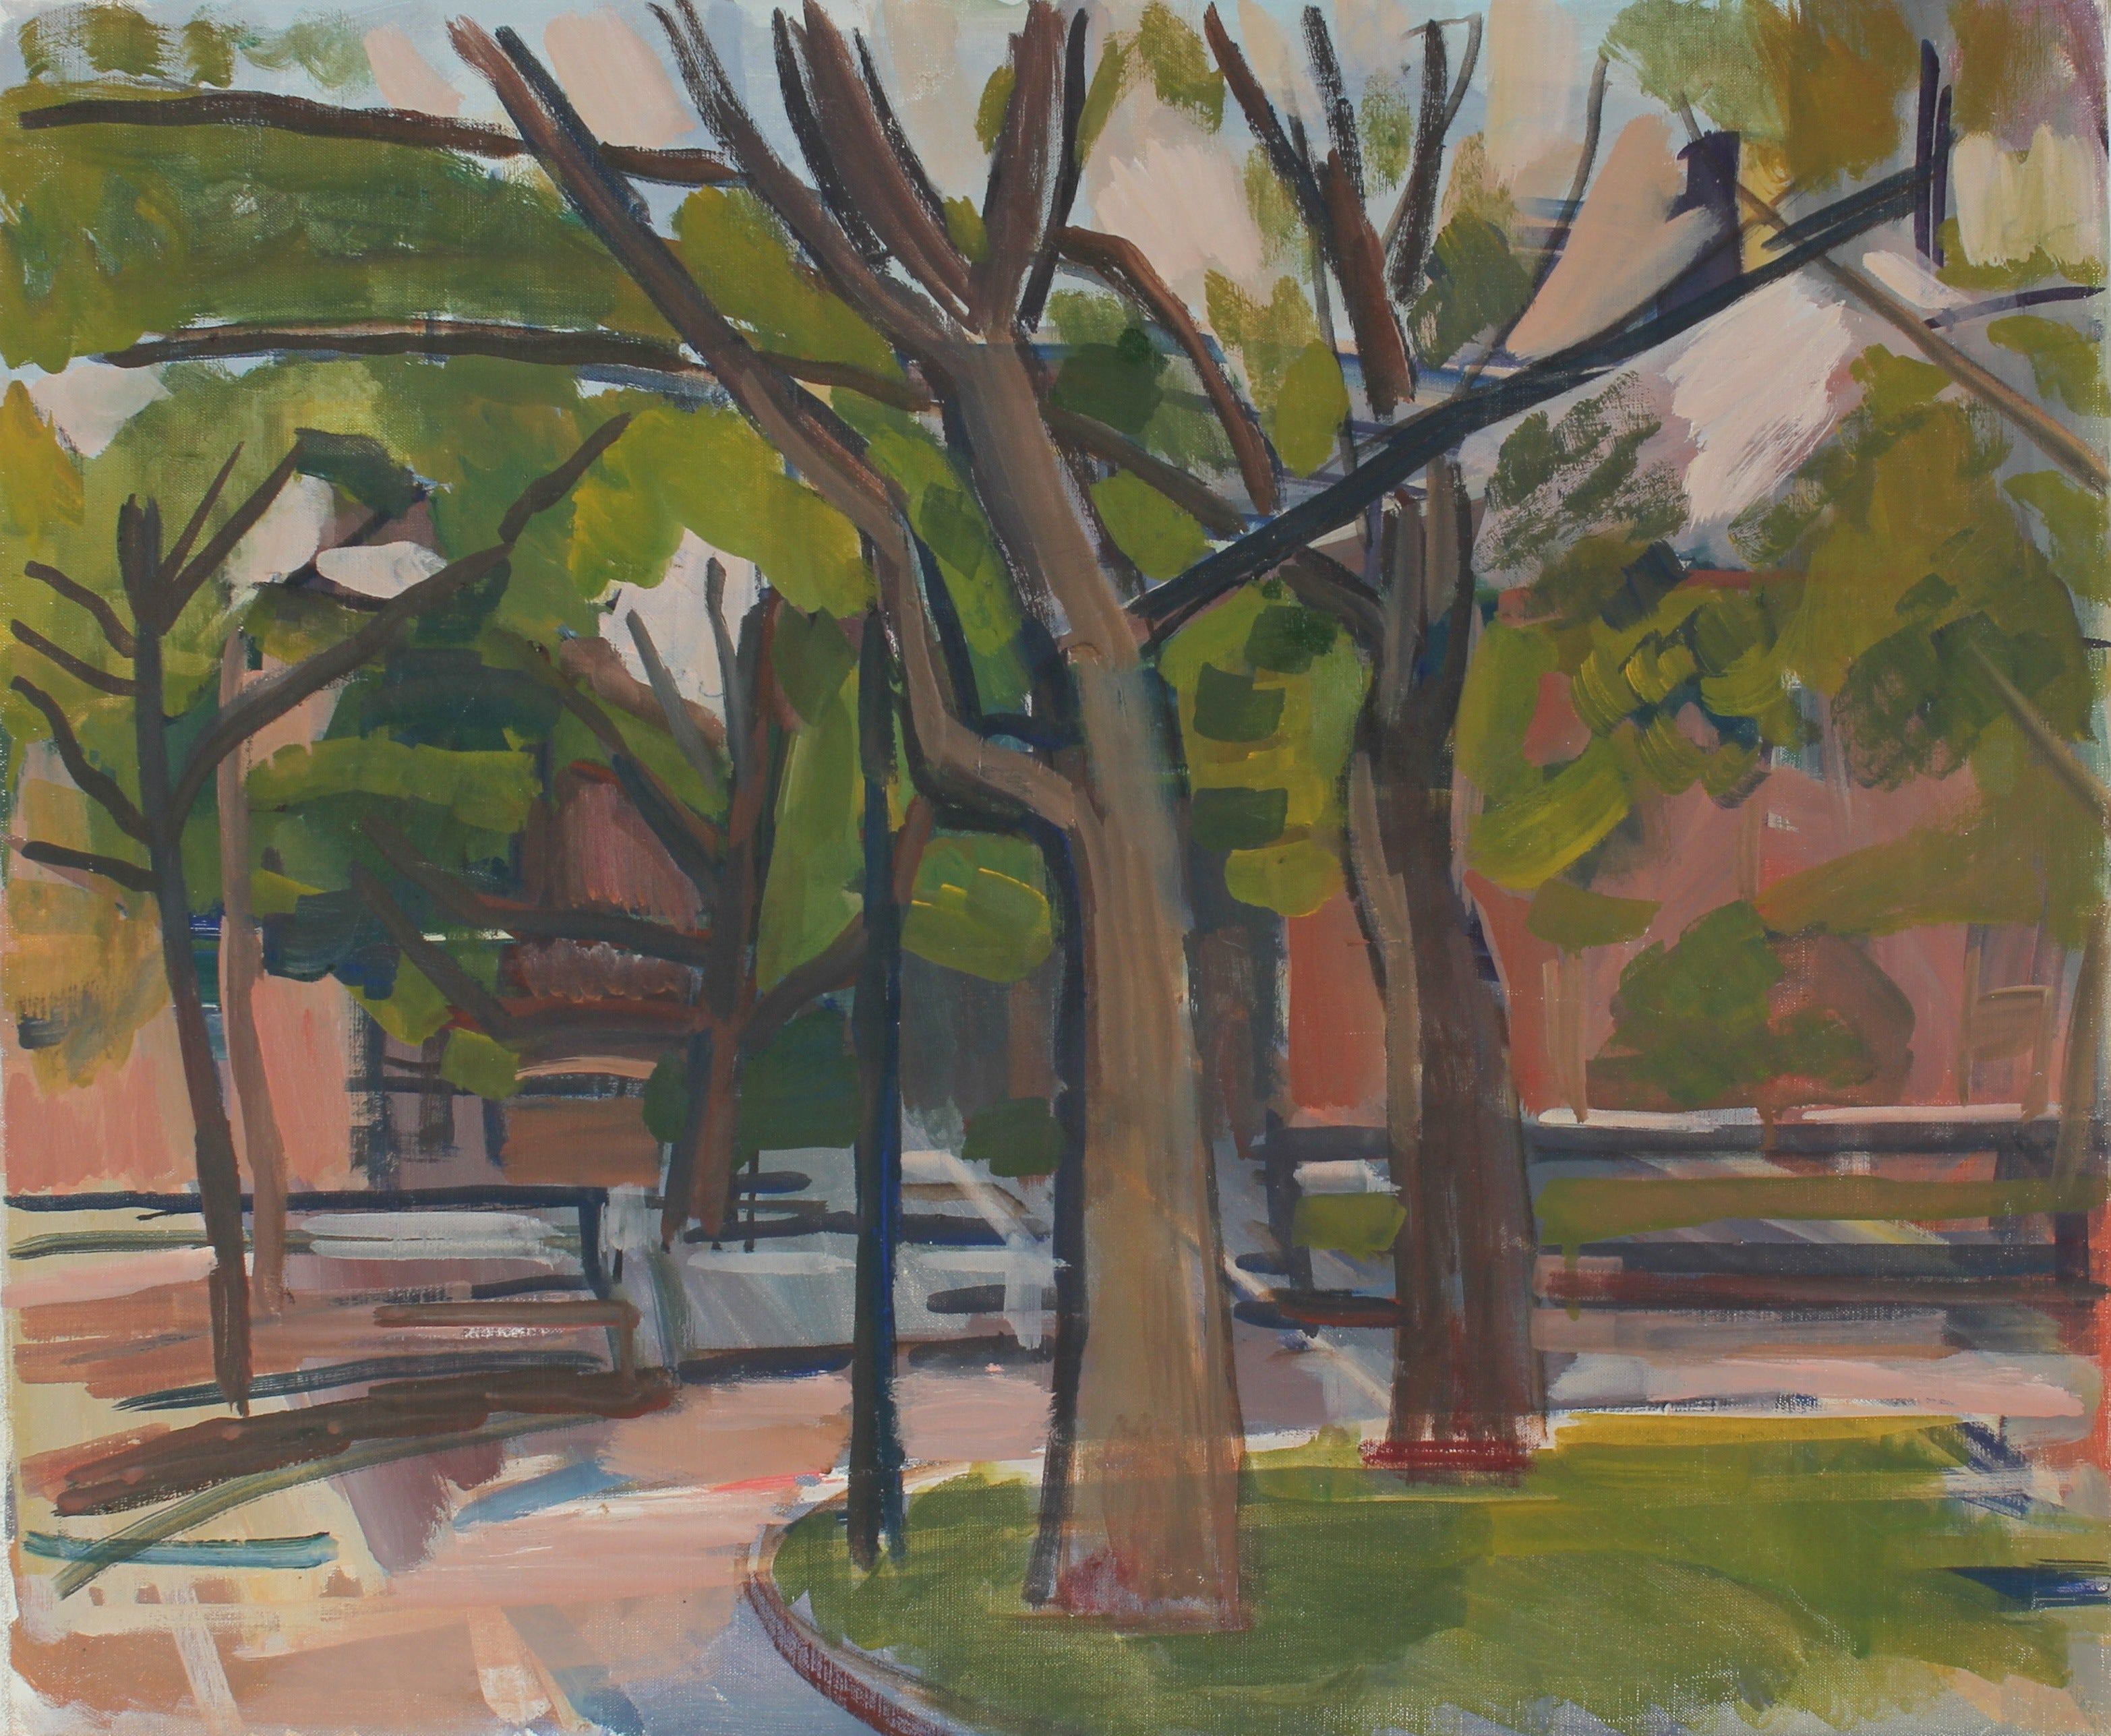 City Park Through Trees, Oil On Canvas Landscape, Late 20th Century